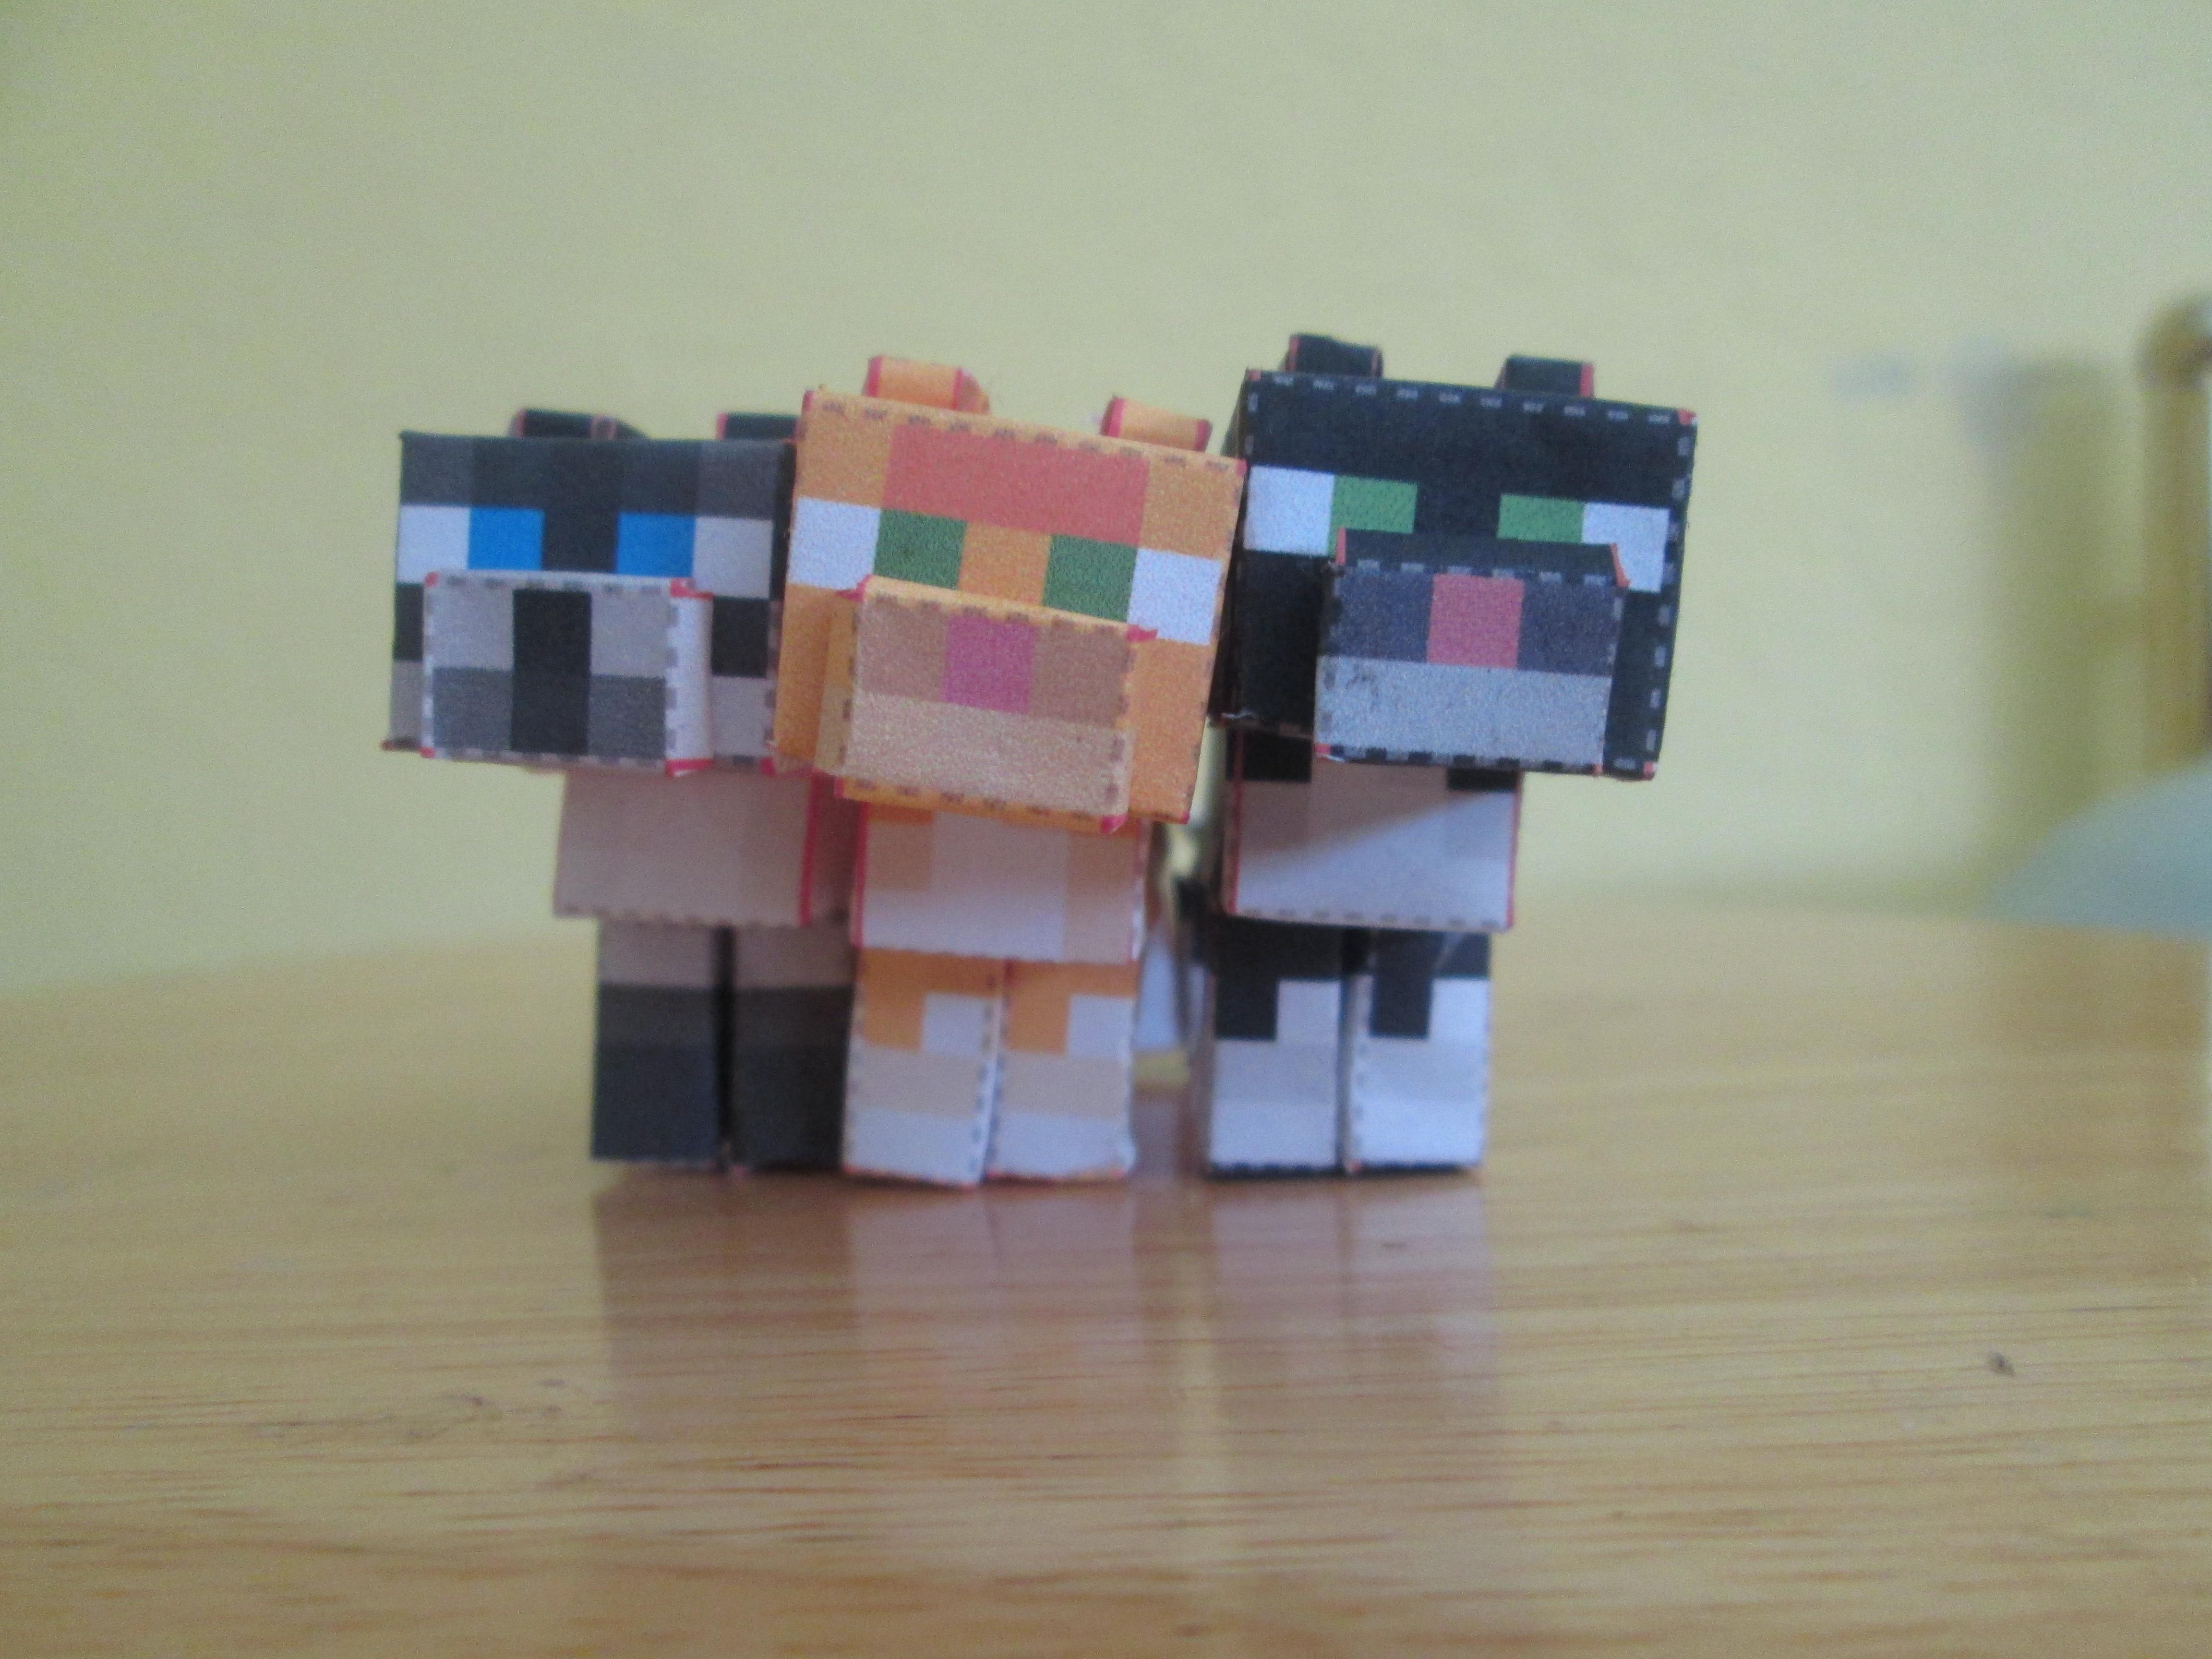 Minecraft Papercraft Cats - DIY